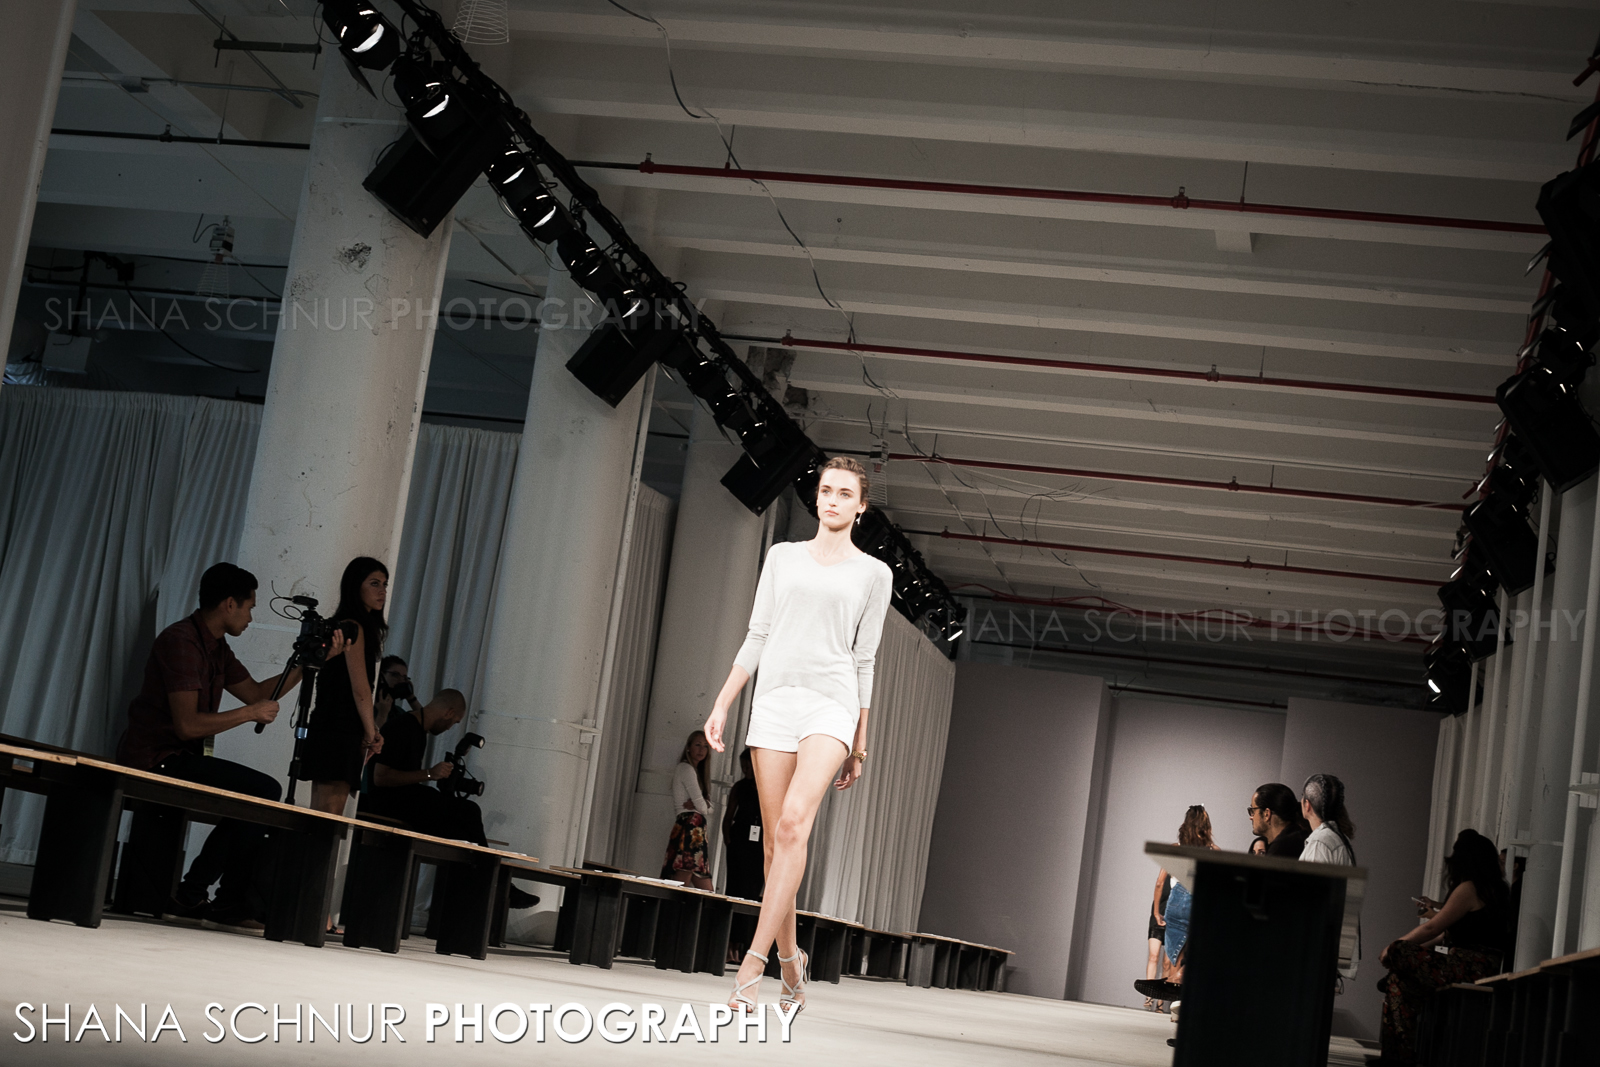 JMendel-Shana-Schnur-Photography--010.jpg